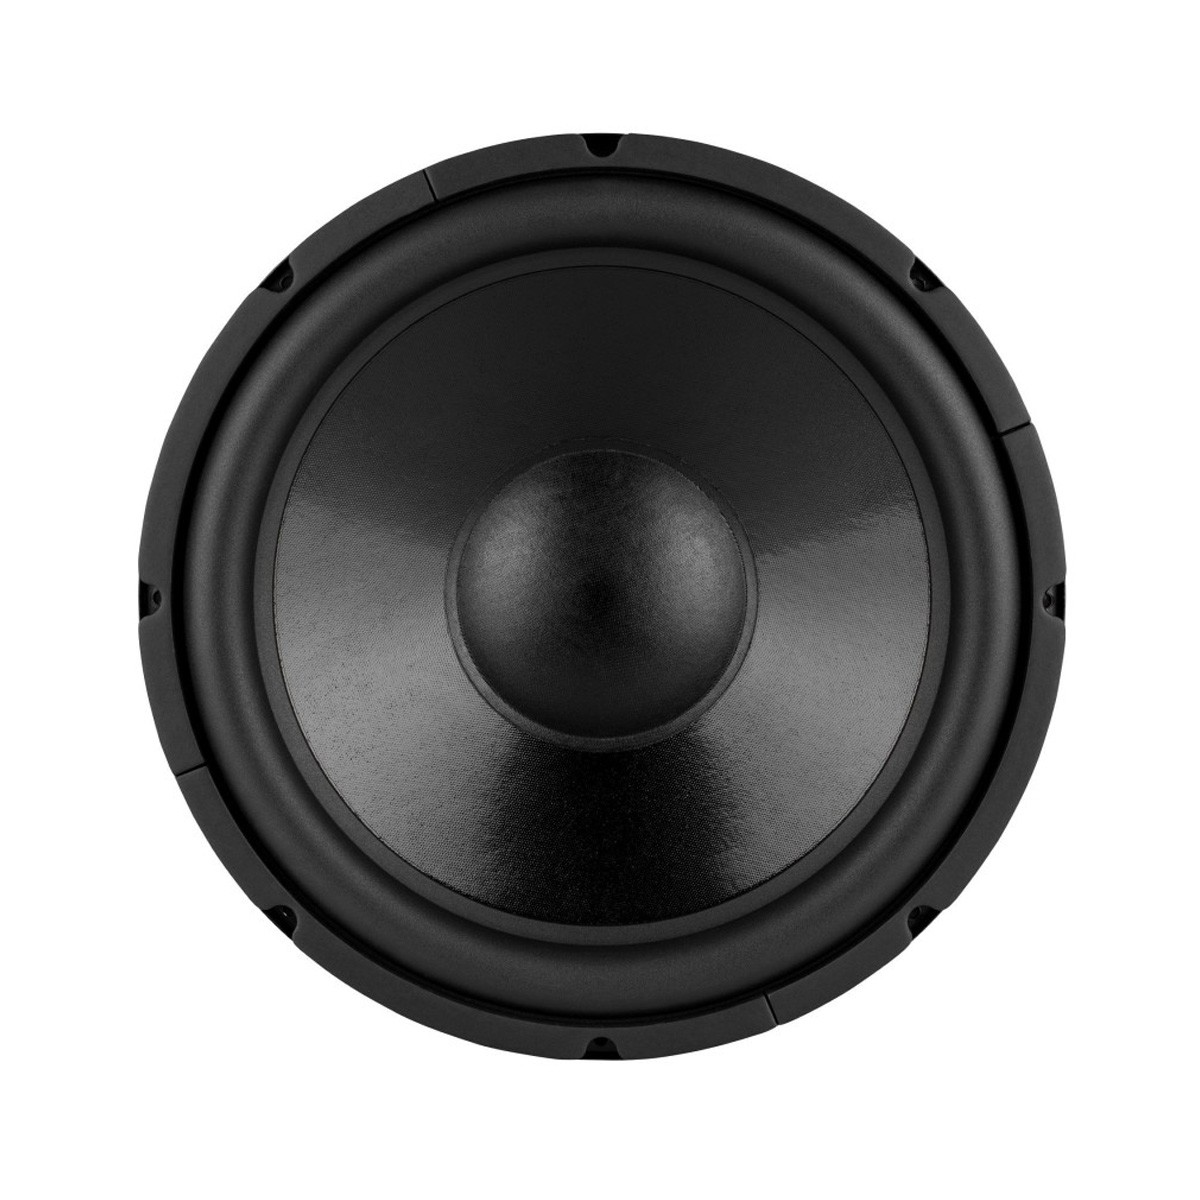 DAYTON AUDIO DCS380-4 Subwoofer Speaker 4 Ohm Ø38cm